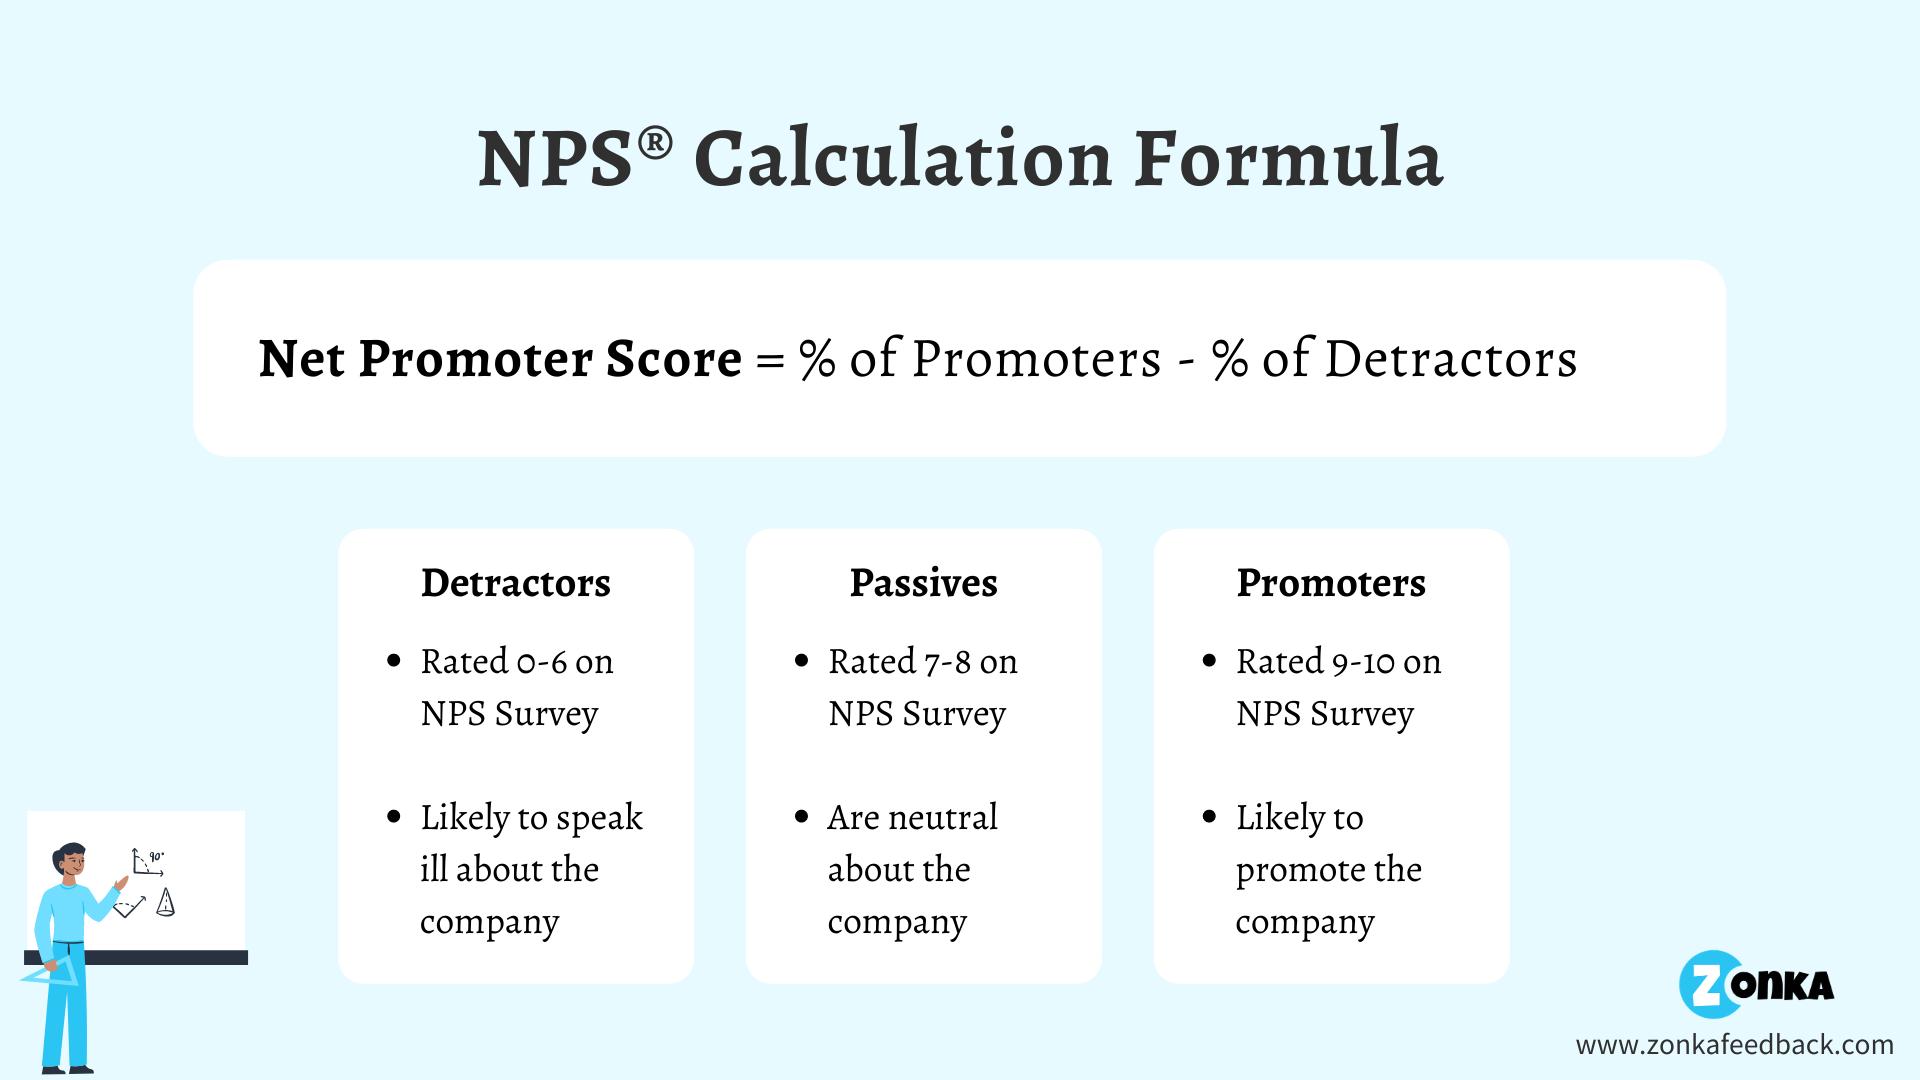 NPS Calculation Formula